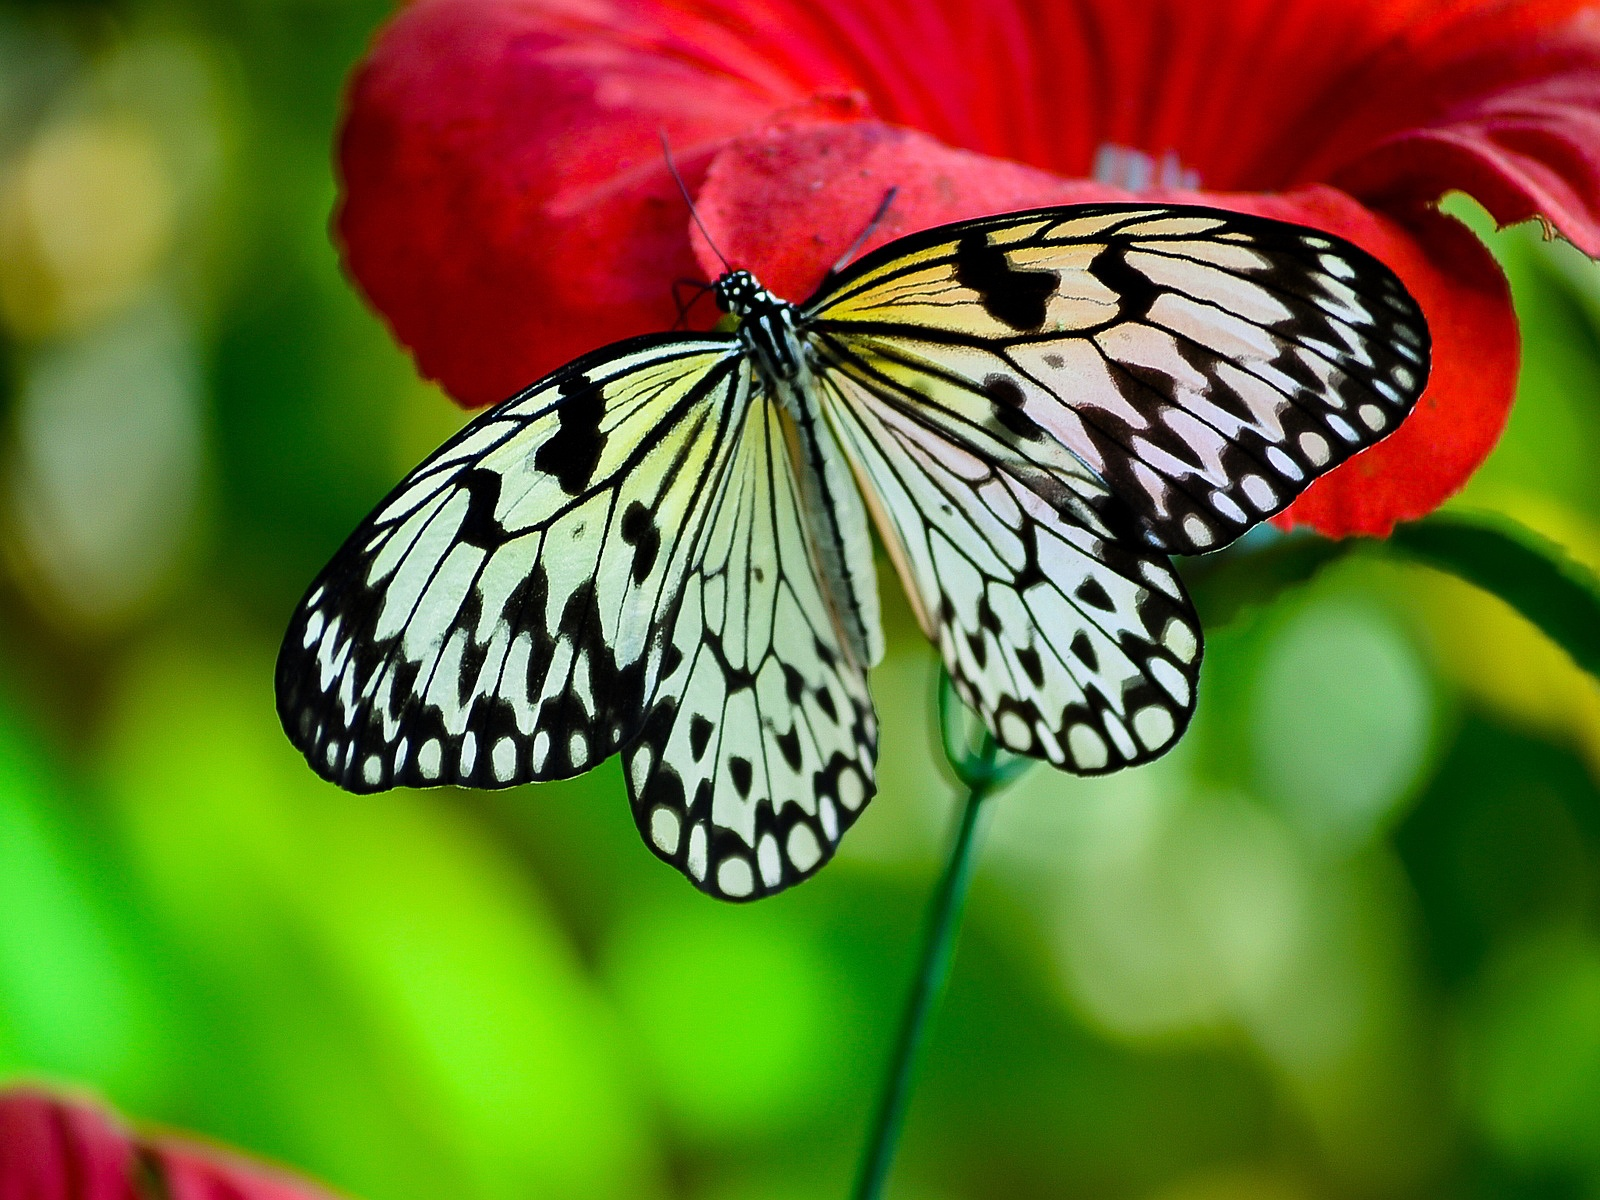 Black White Butterfly Wallpaper in 1600x1200 Normal